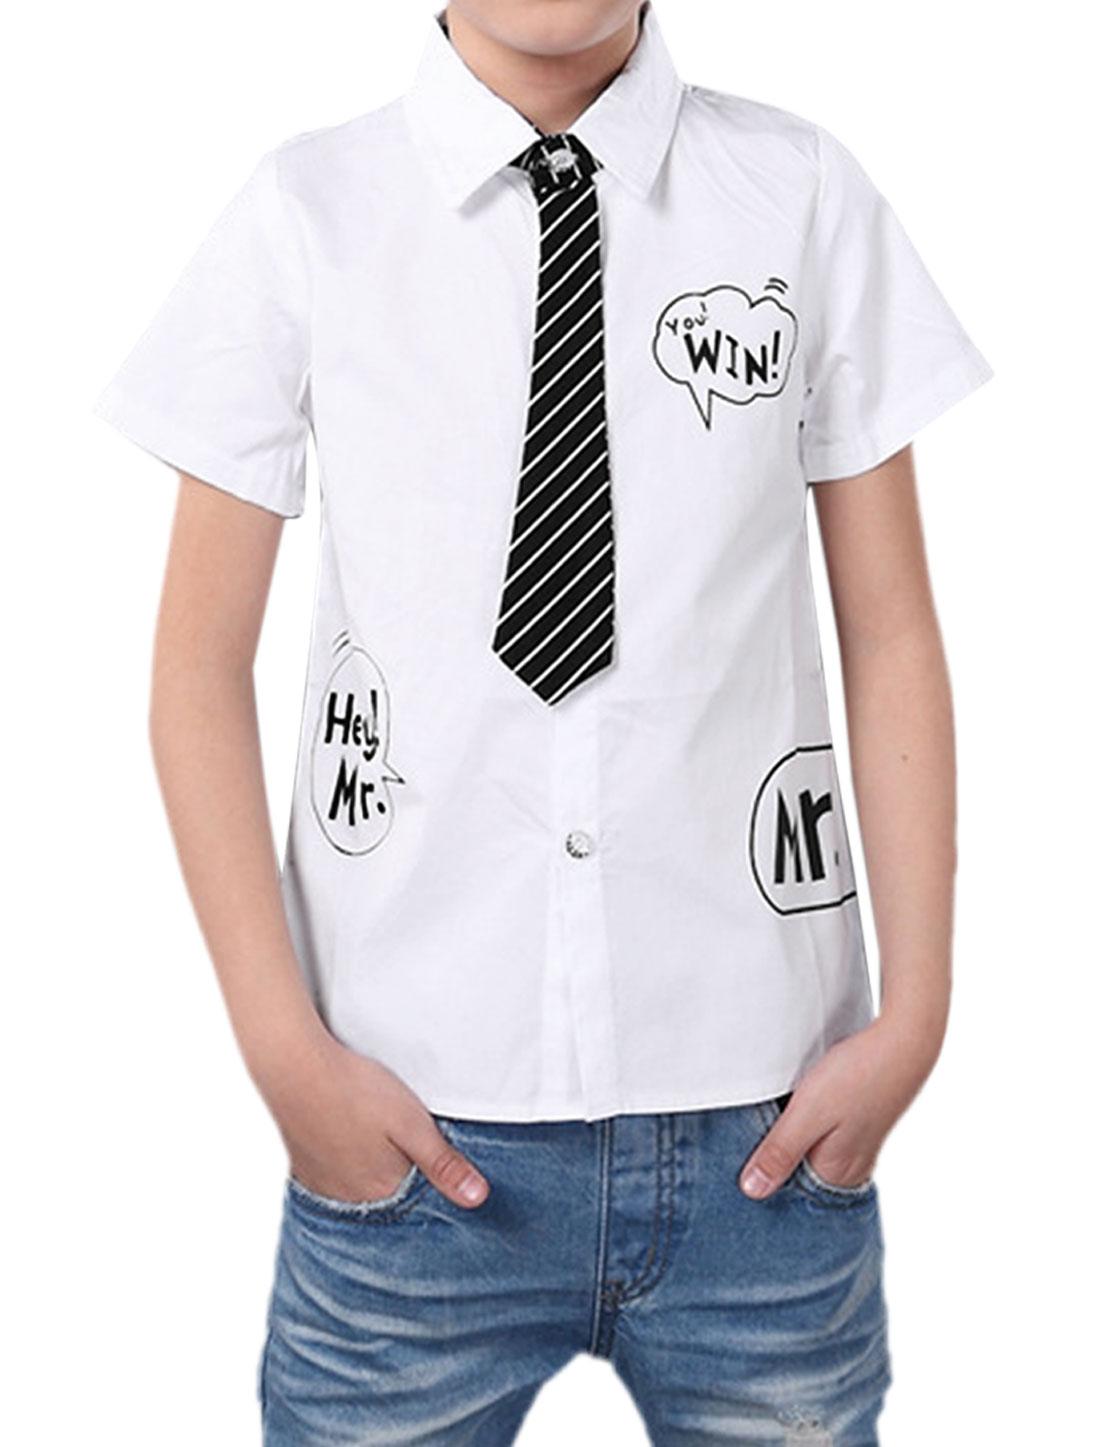 Boys Letters Prints Single Breasted Long Sleeves Shirt Allegra Kids White 12